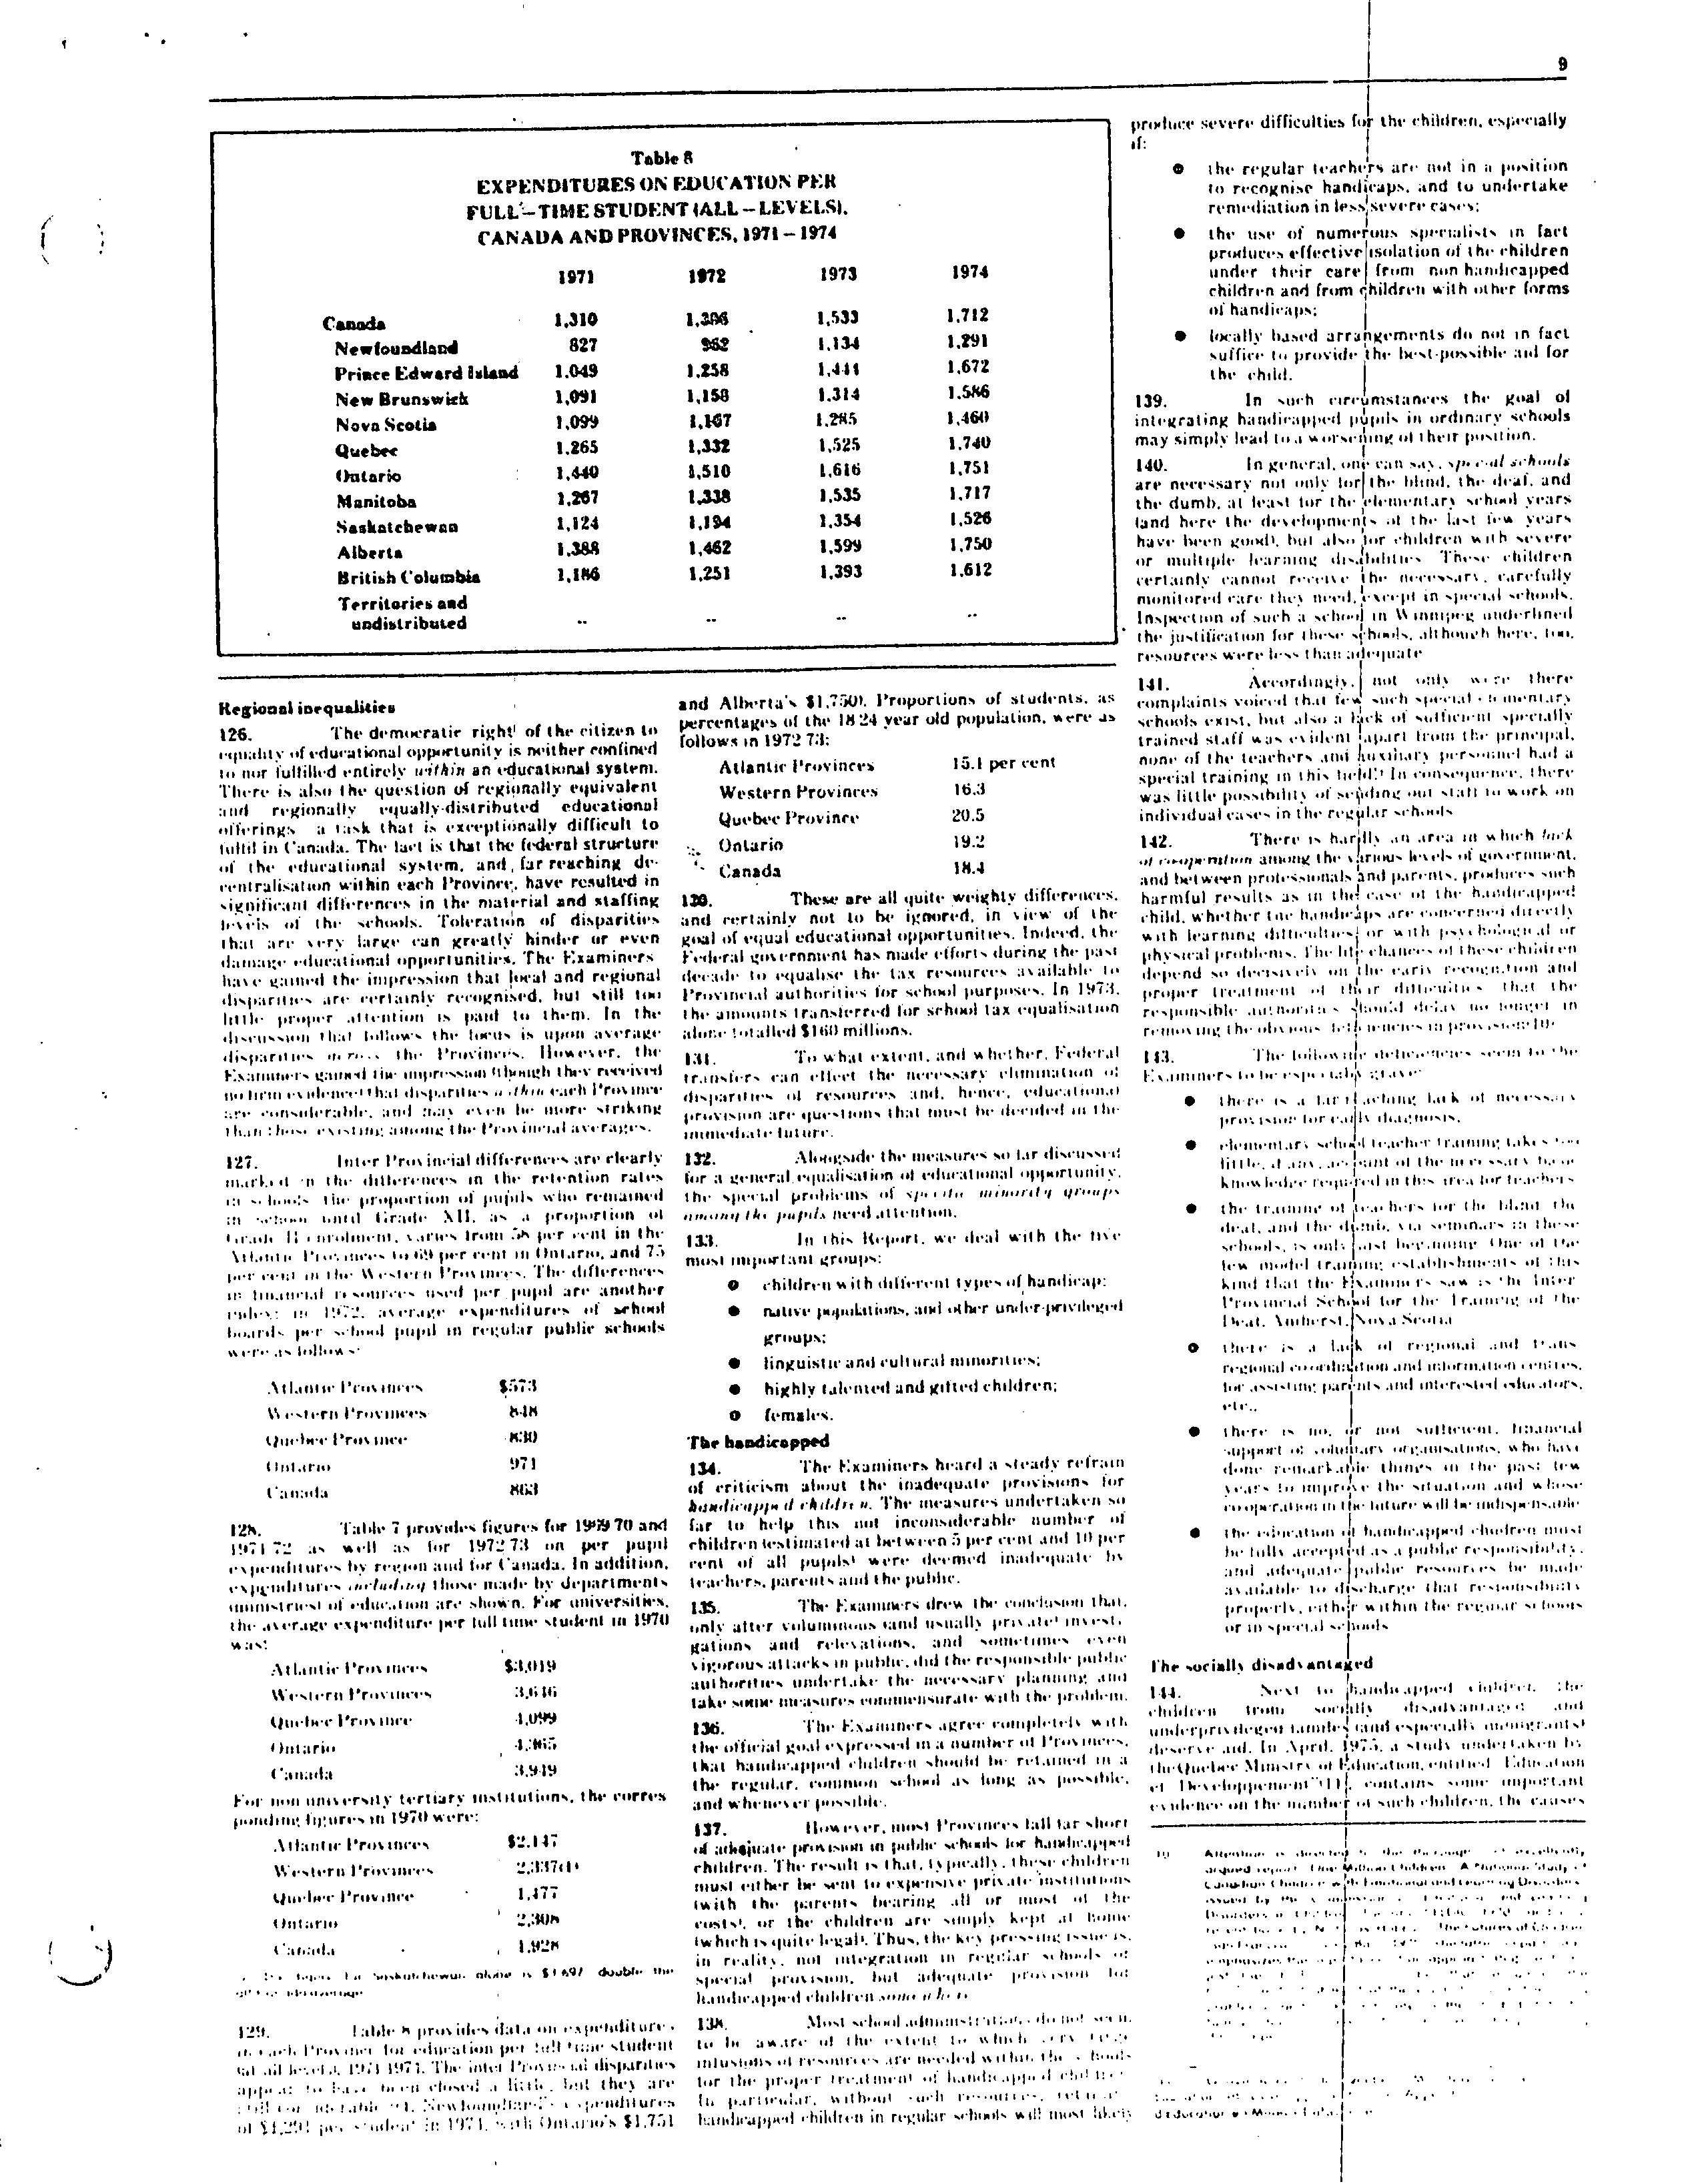 Page 1 Page 2 Page 3 Page 4 Page 5 Page 6 Page 7 Page 8 Page 9